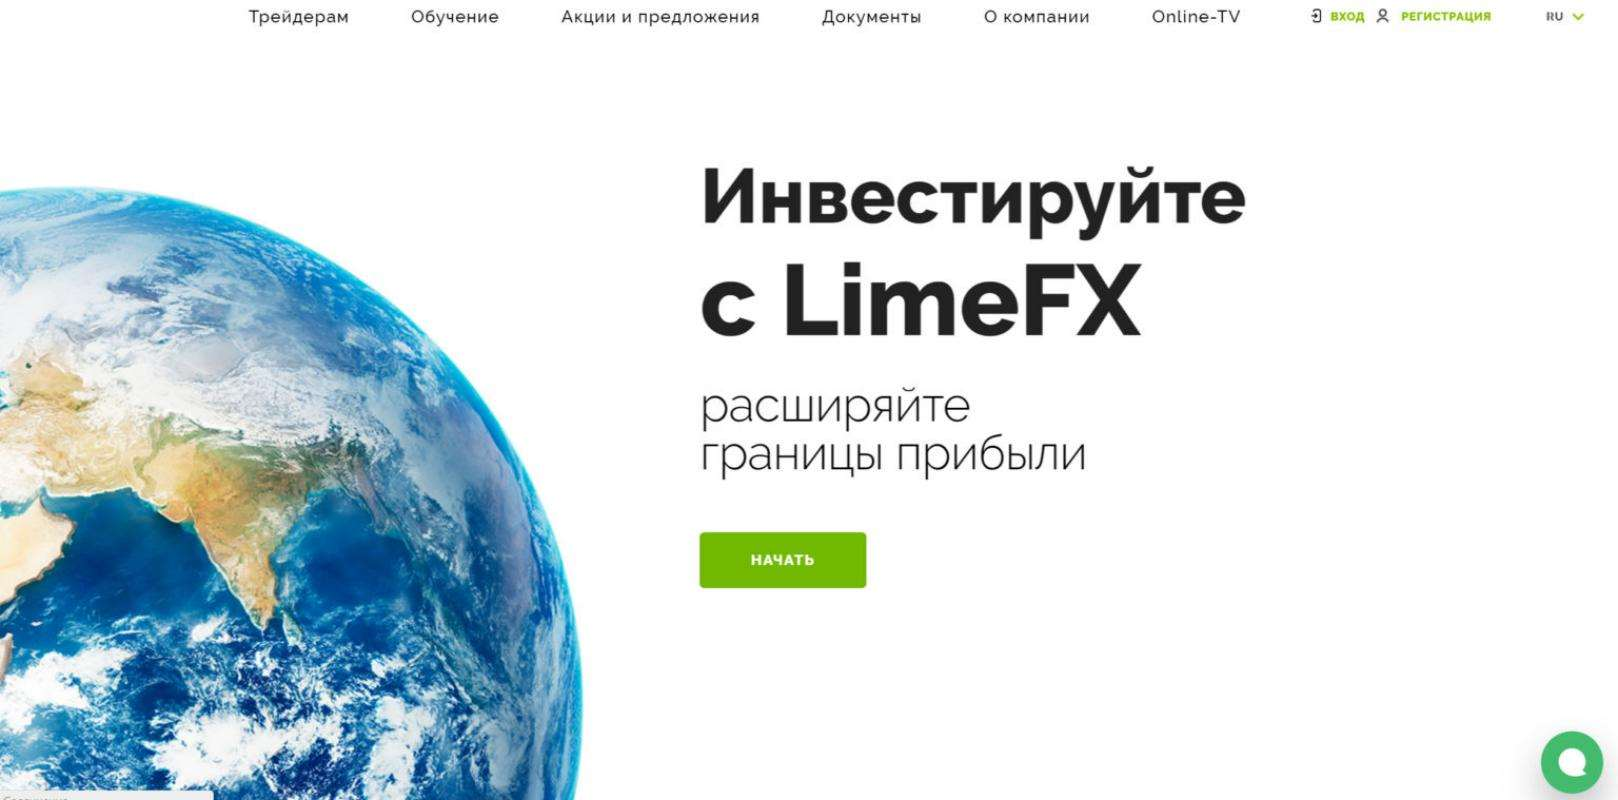 Обзор брокера LimeFX, плюсы и минусы